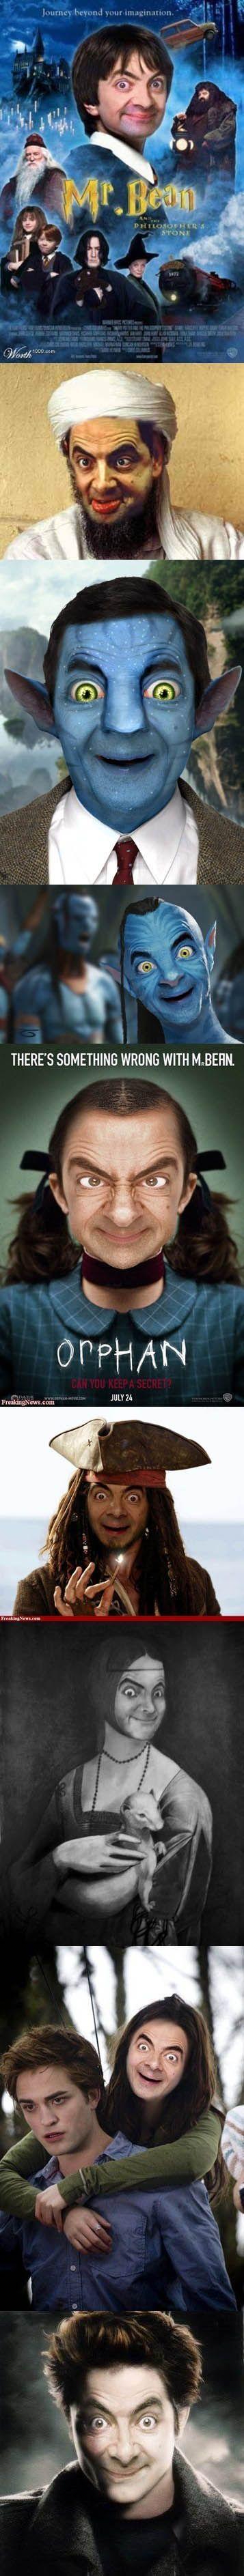 haha... Mr. Bean.